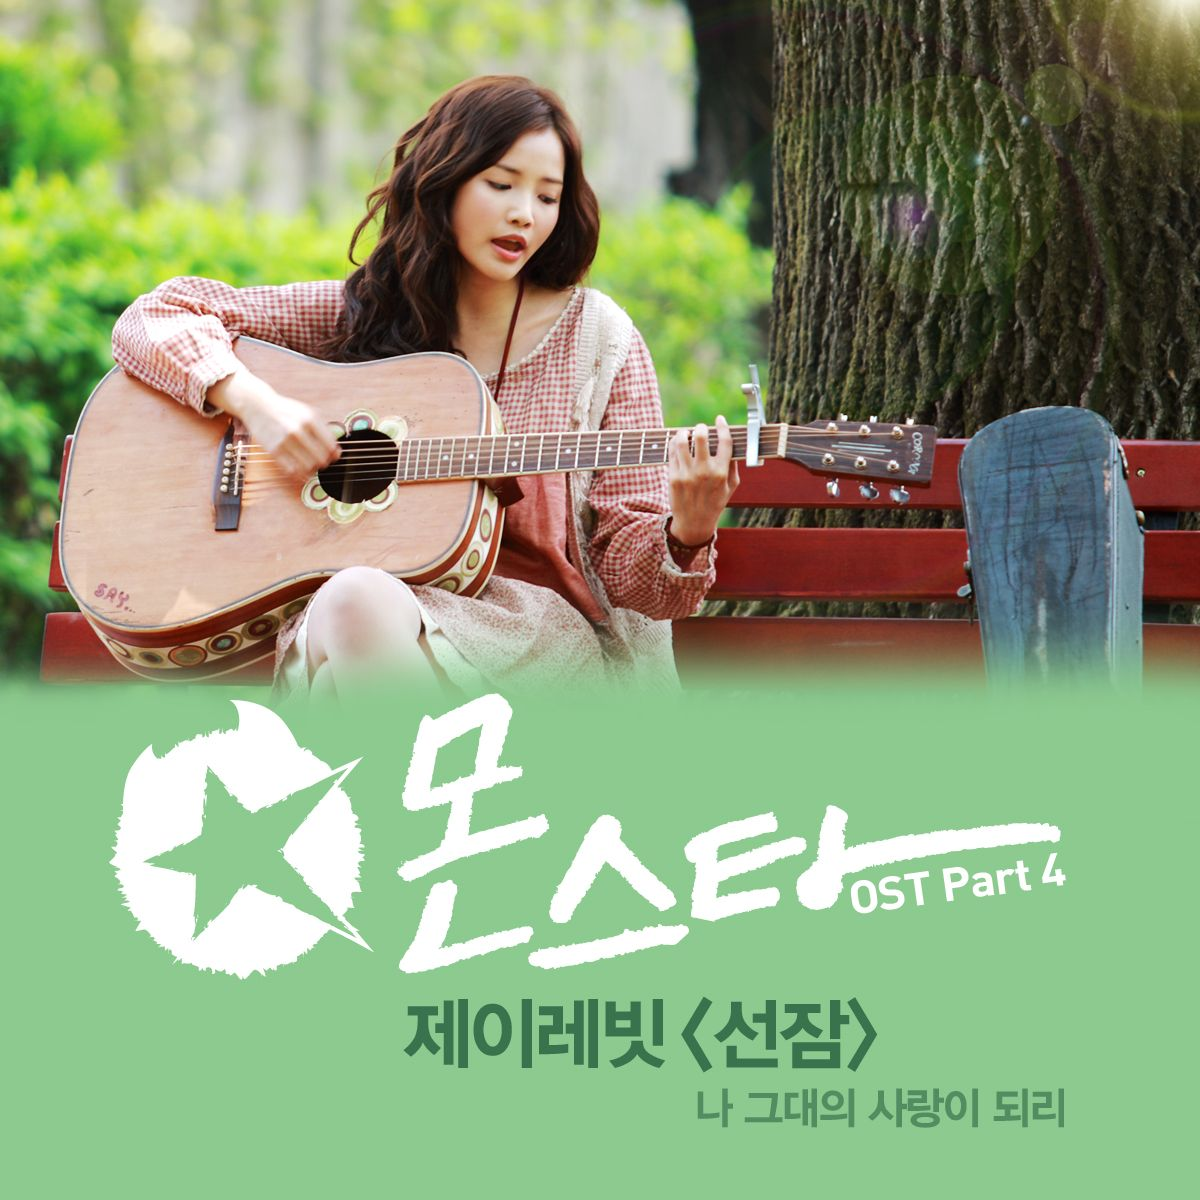 [Single] J Rabbit - Monstar OST Part.4